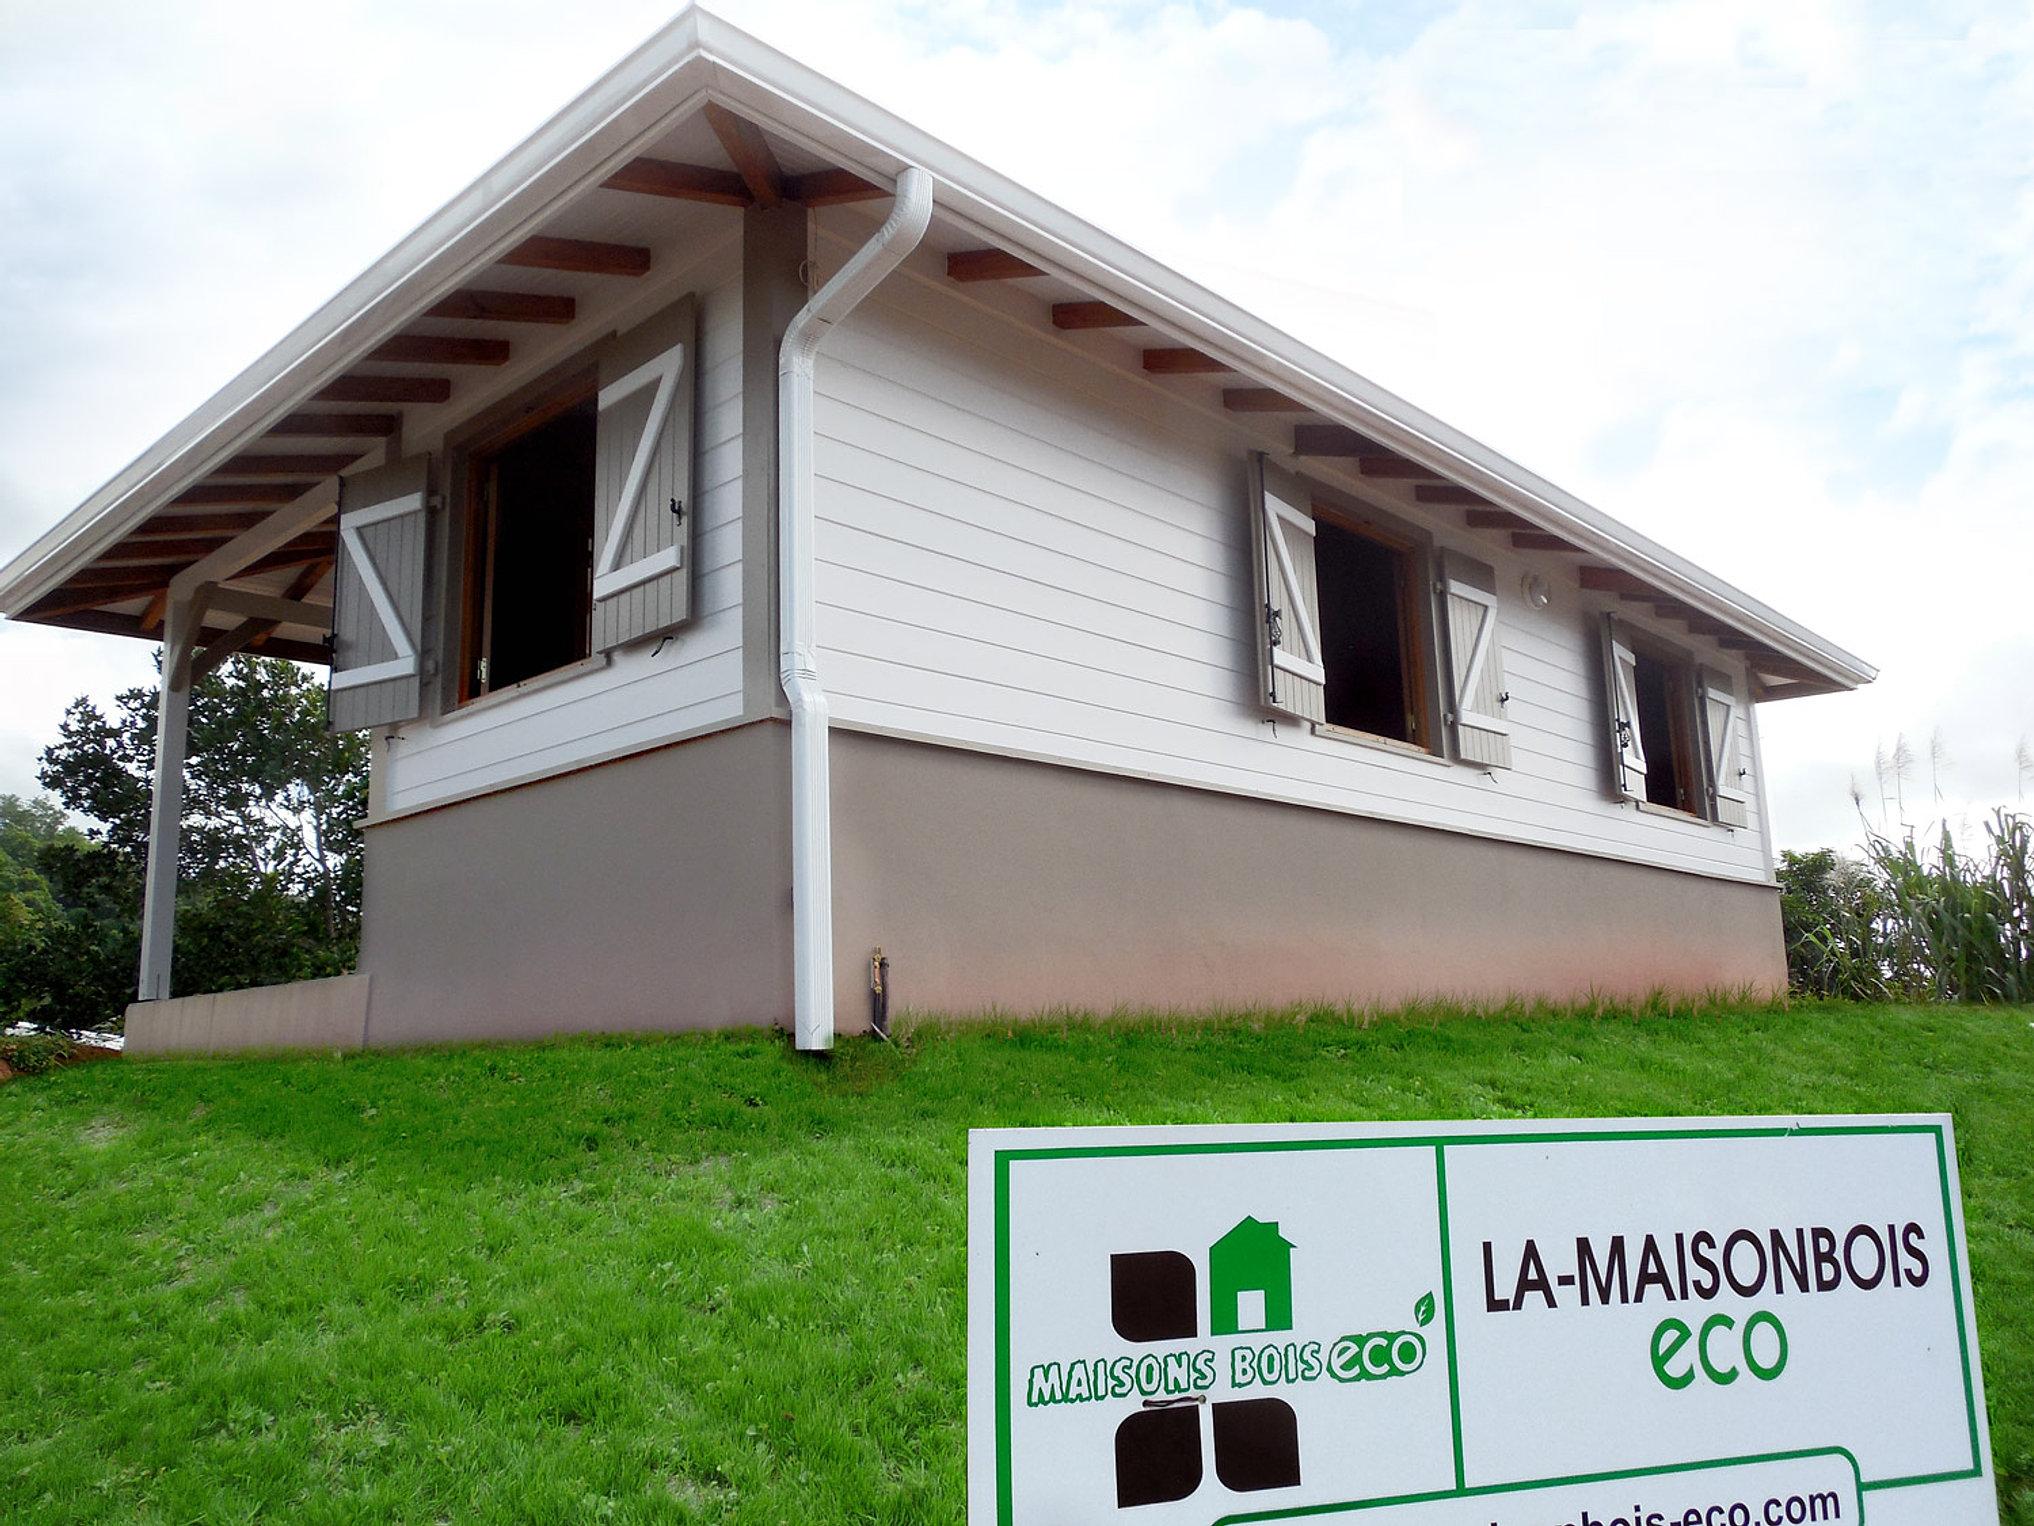 Maison bois antilles ventana blog - Maison bois eco ...